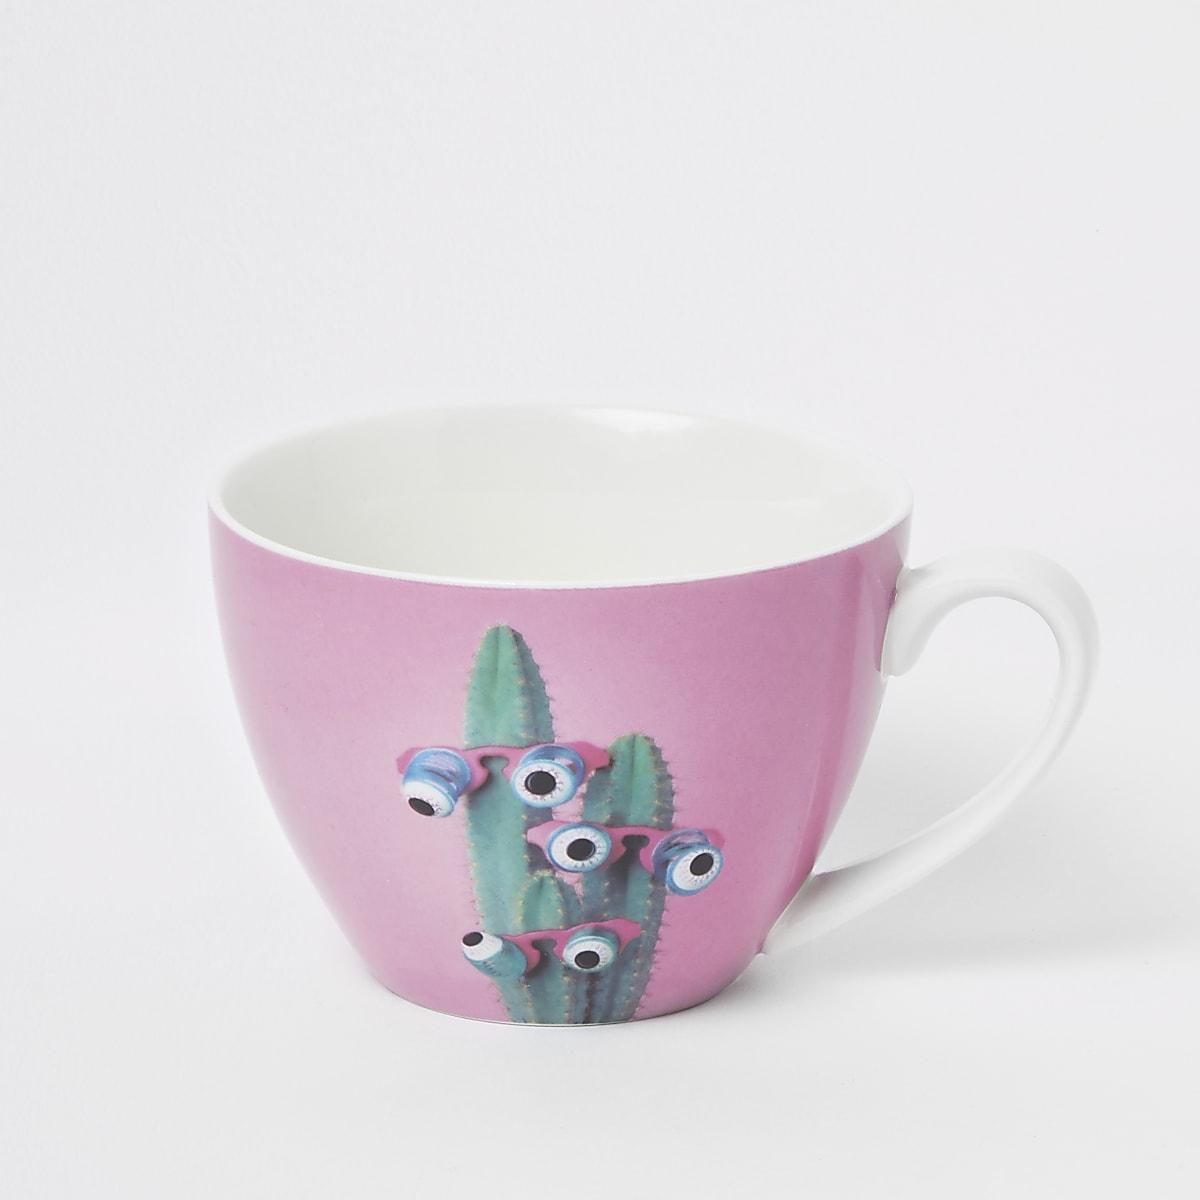 Pink cactus print bowl mug